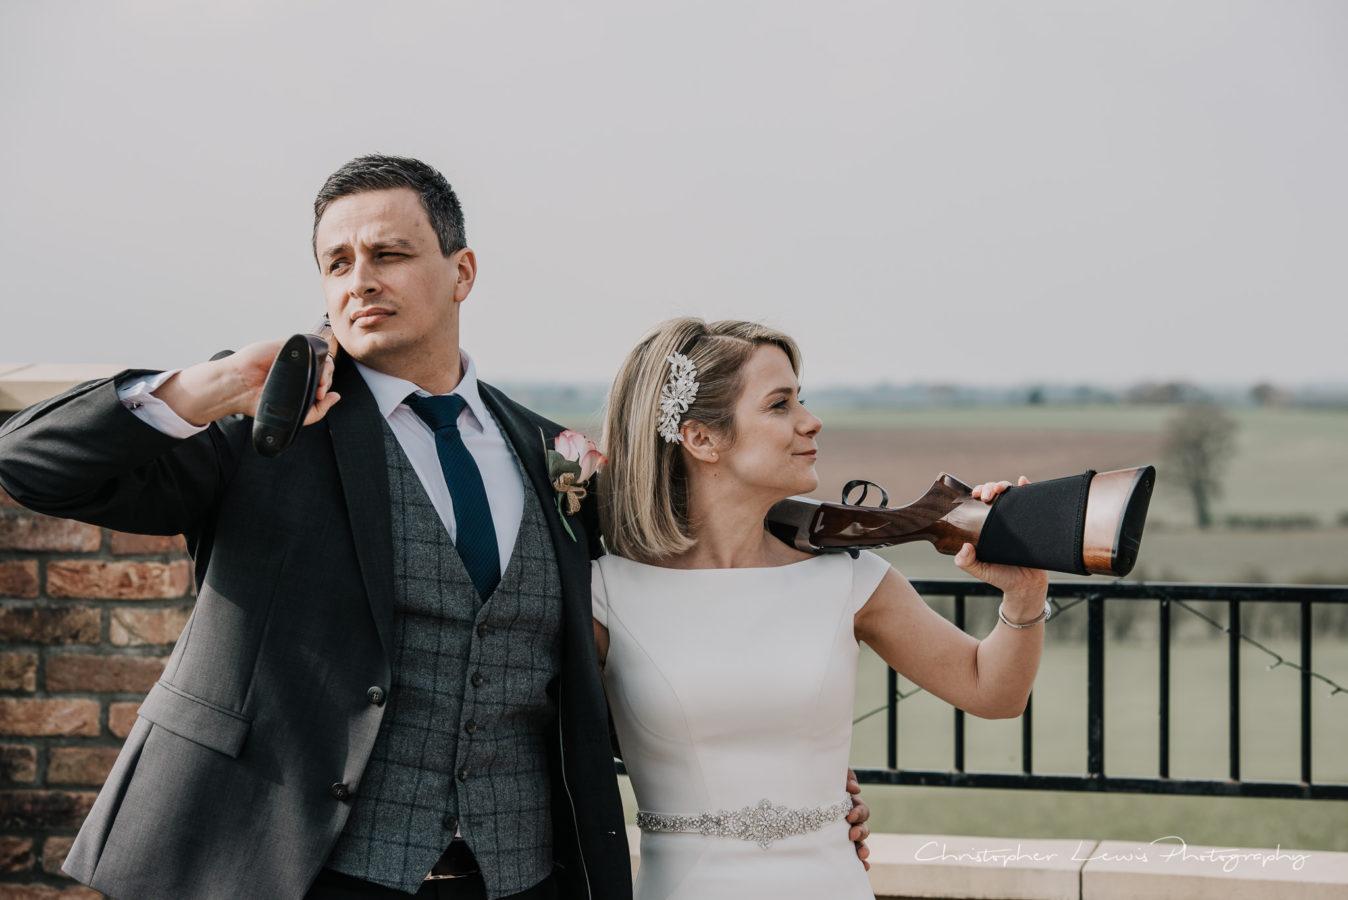 Thief-Hall-Wedding-Christopher-Lewis-Photography-58